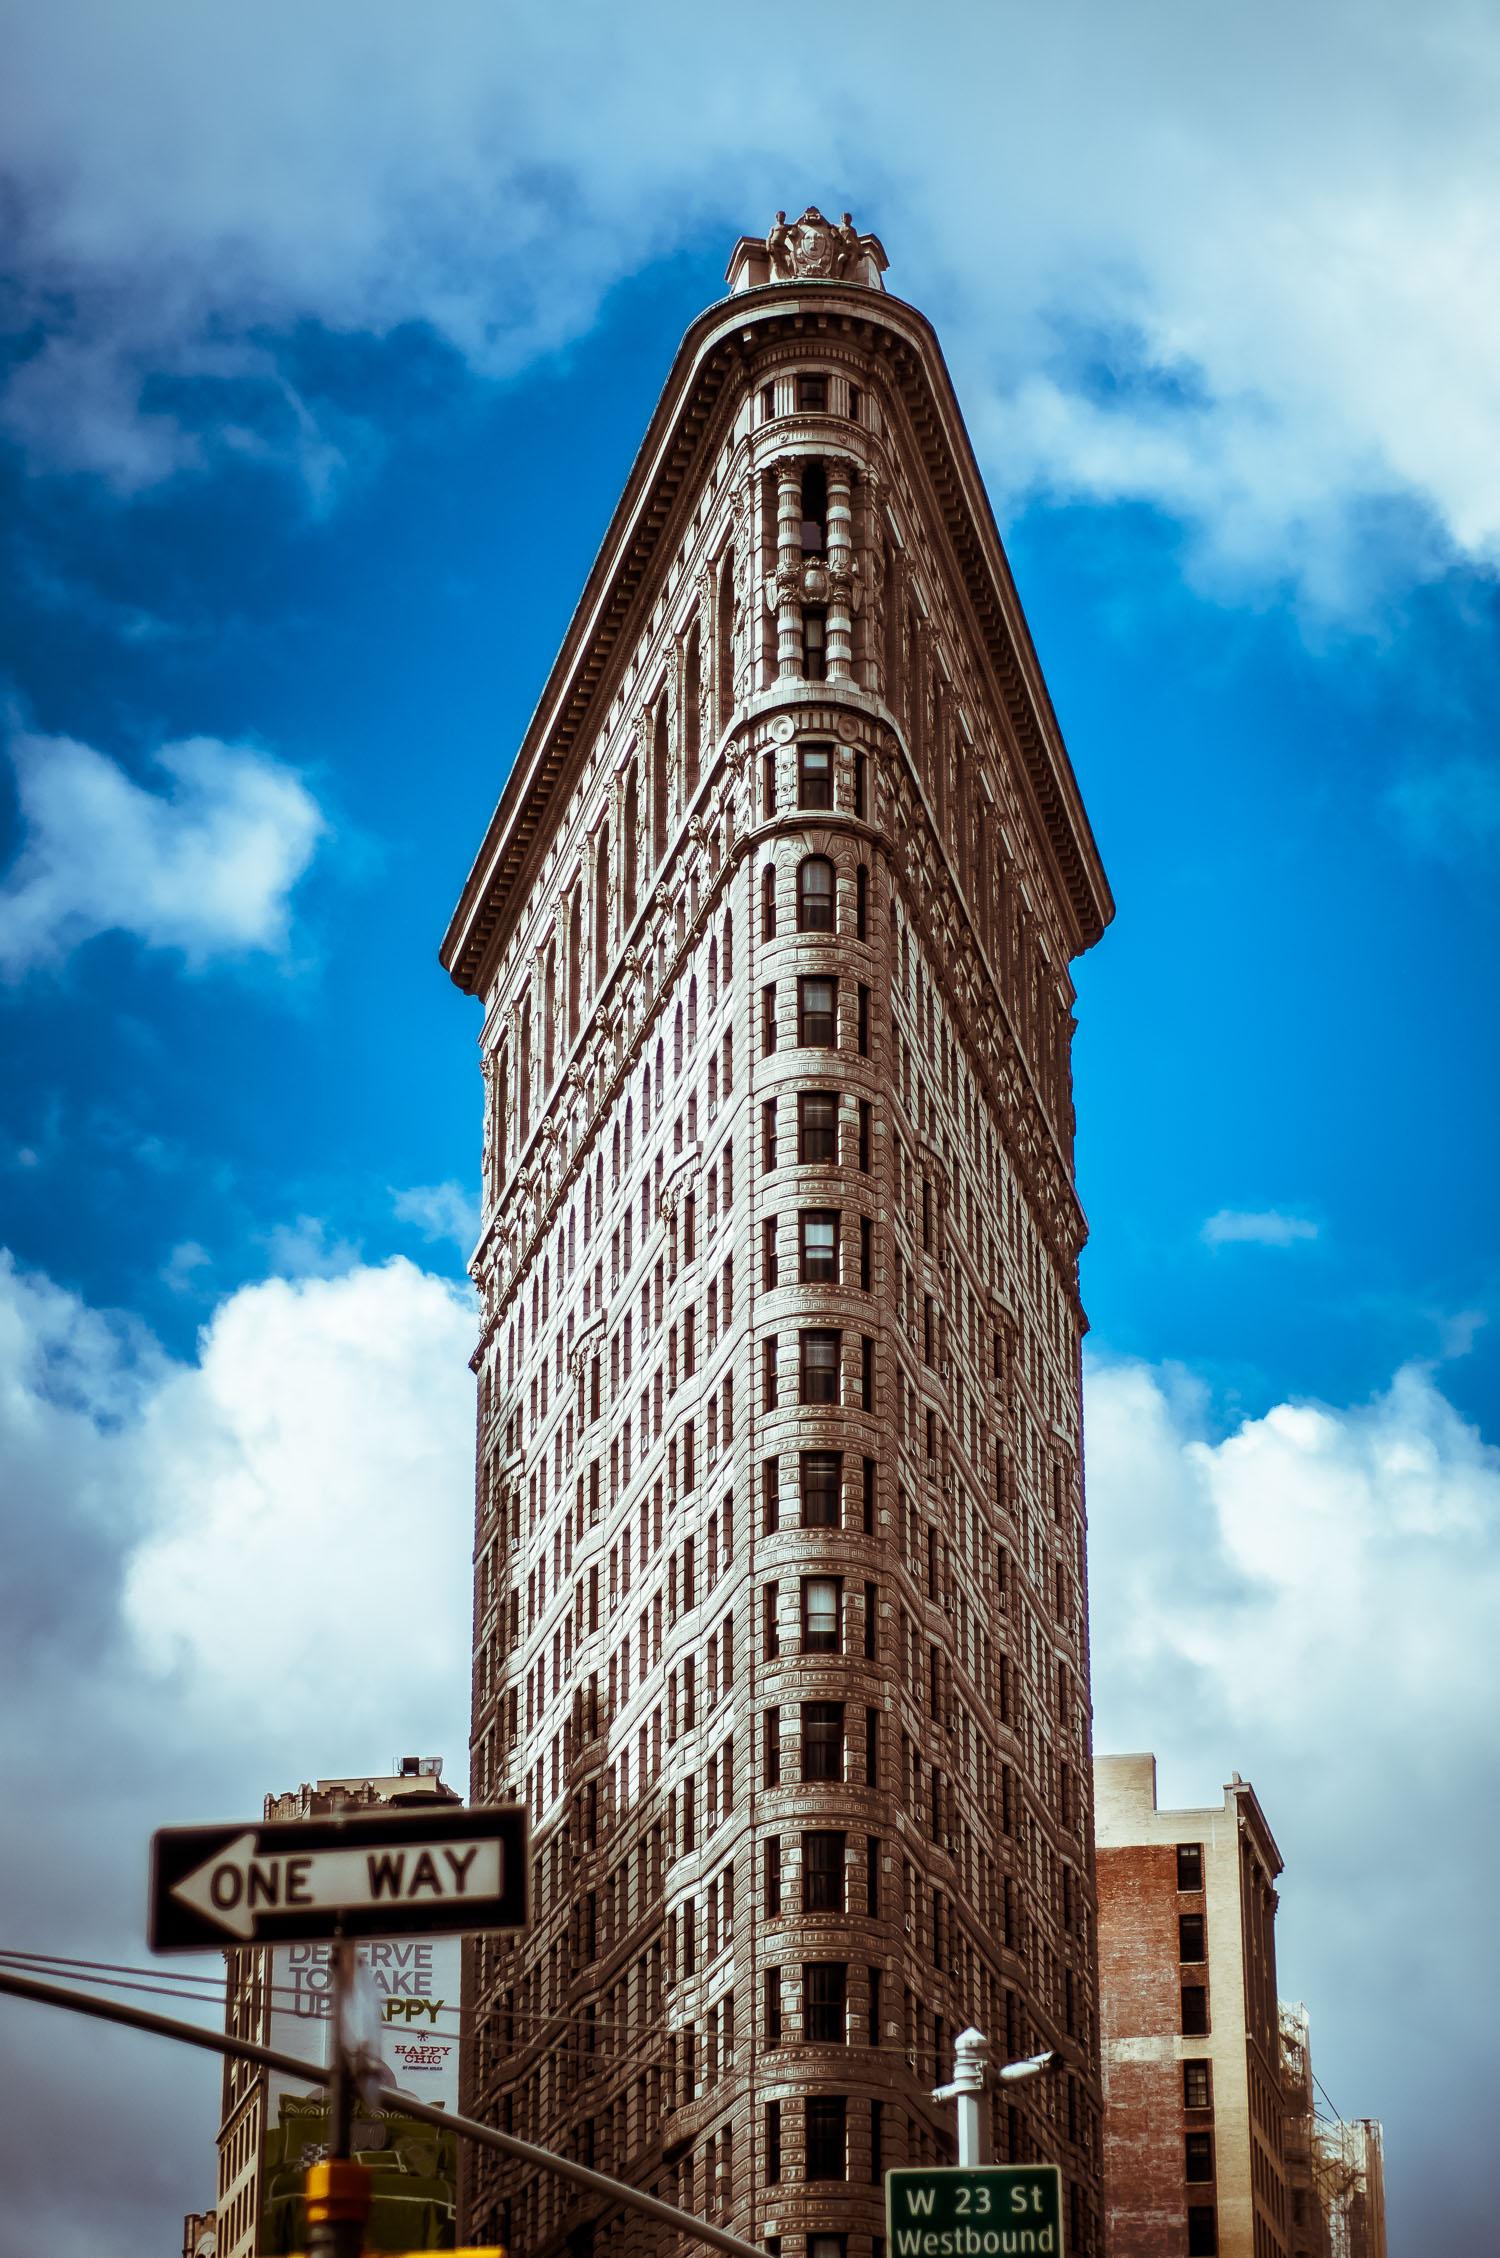 Iconic New York City Photo Tour